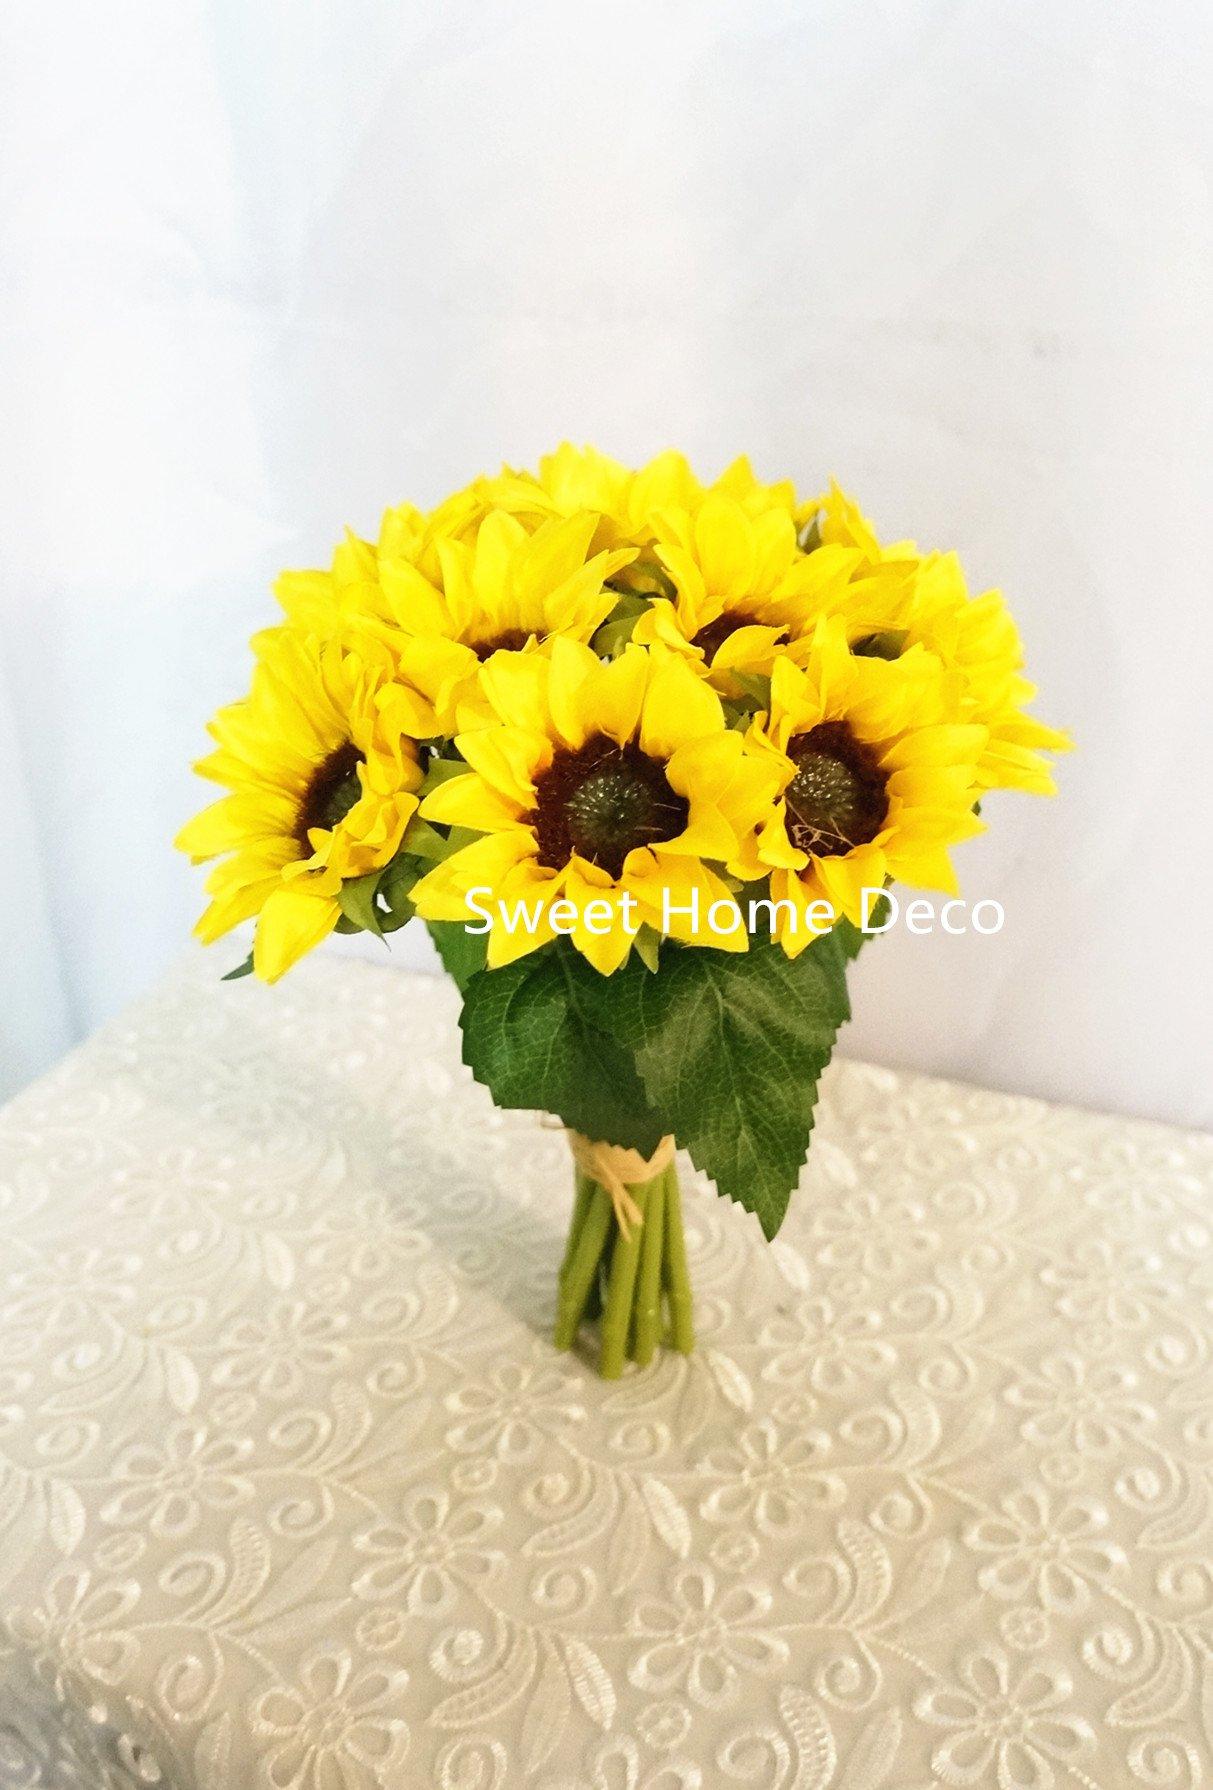 Sweet-Home-Deco-Silk-Sunflower-Artificial-Flower-BouquetFlower-Boutonniere-Wedding-Flowers